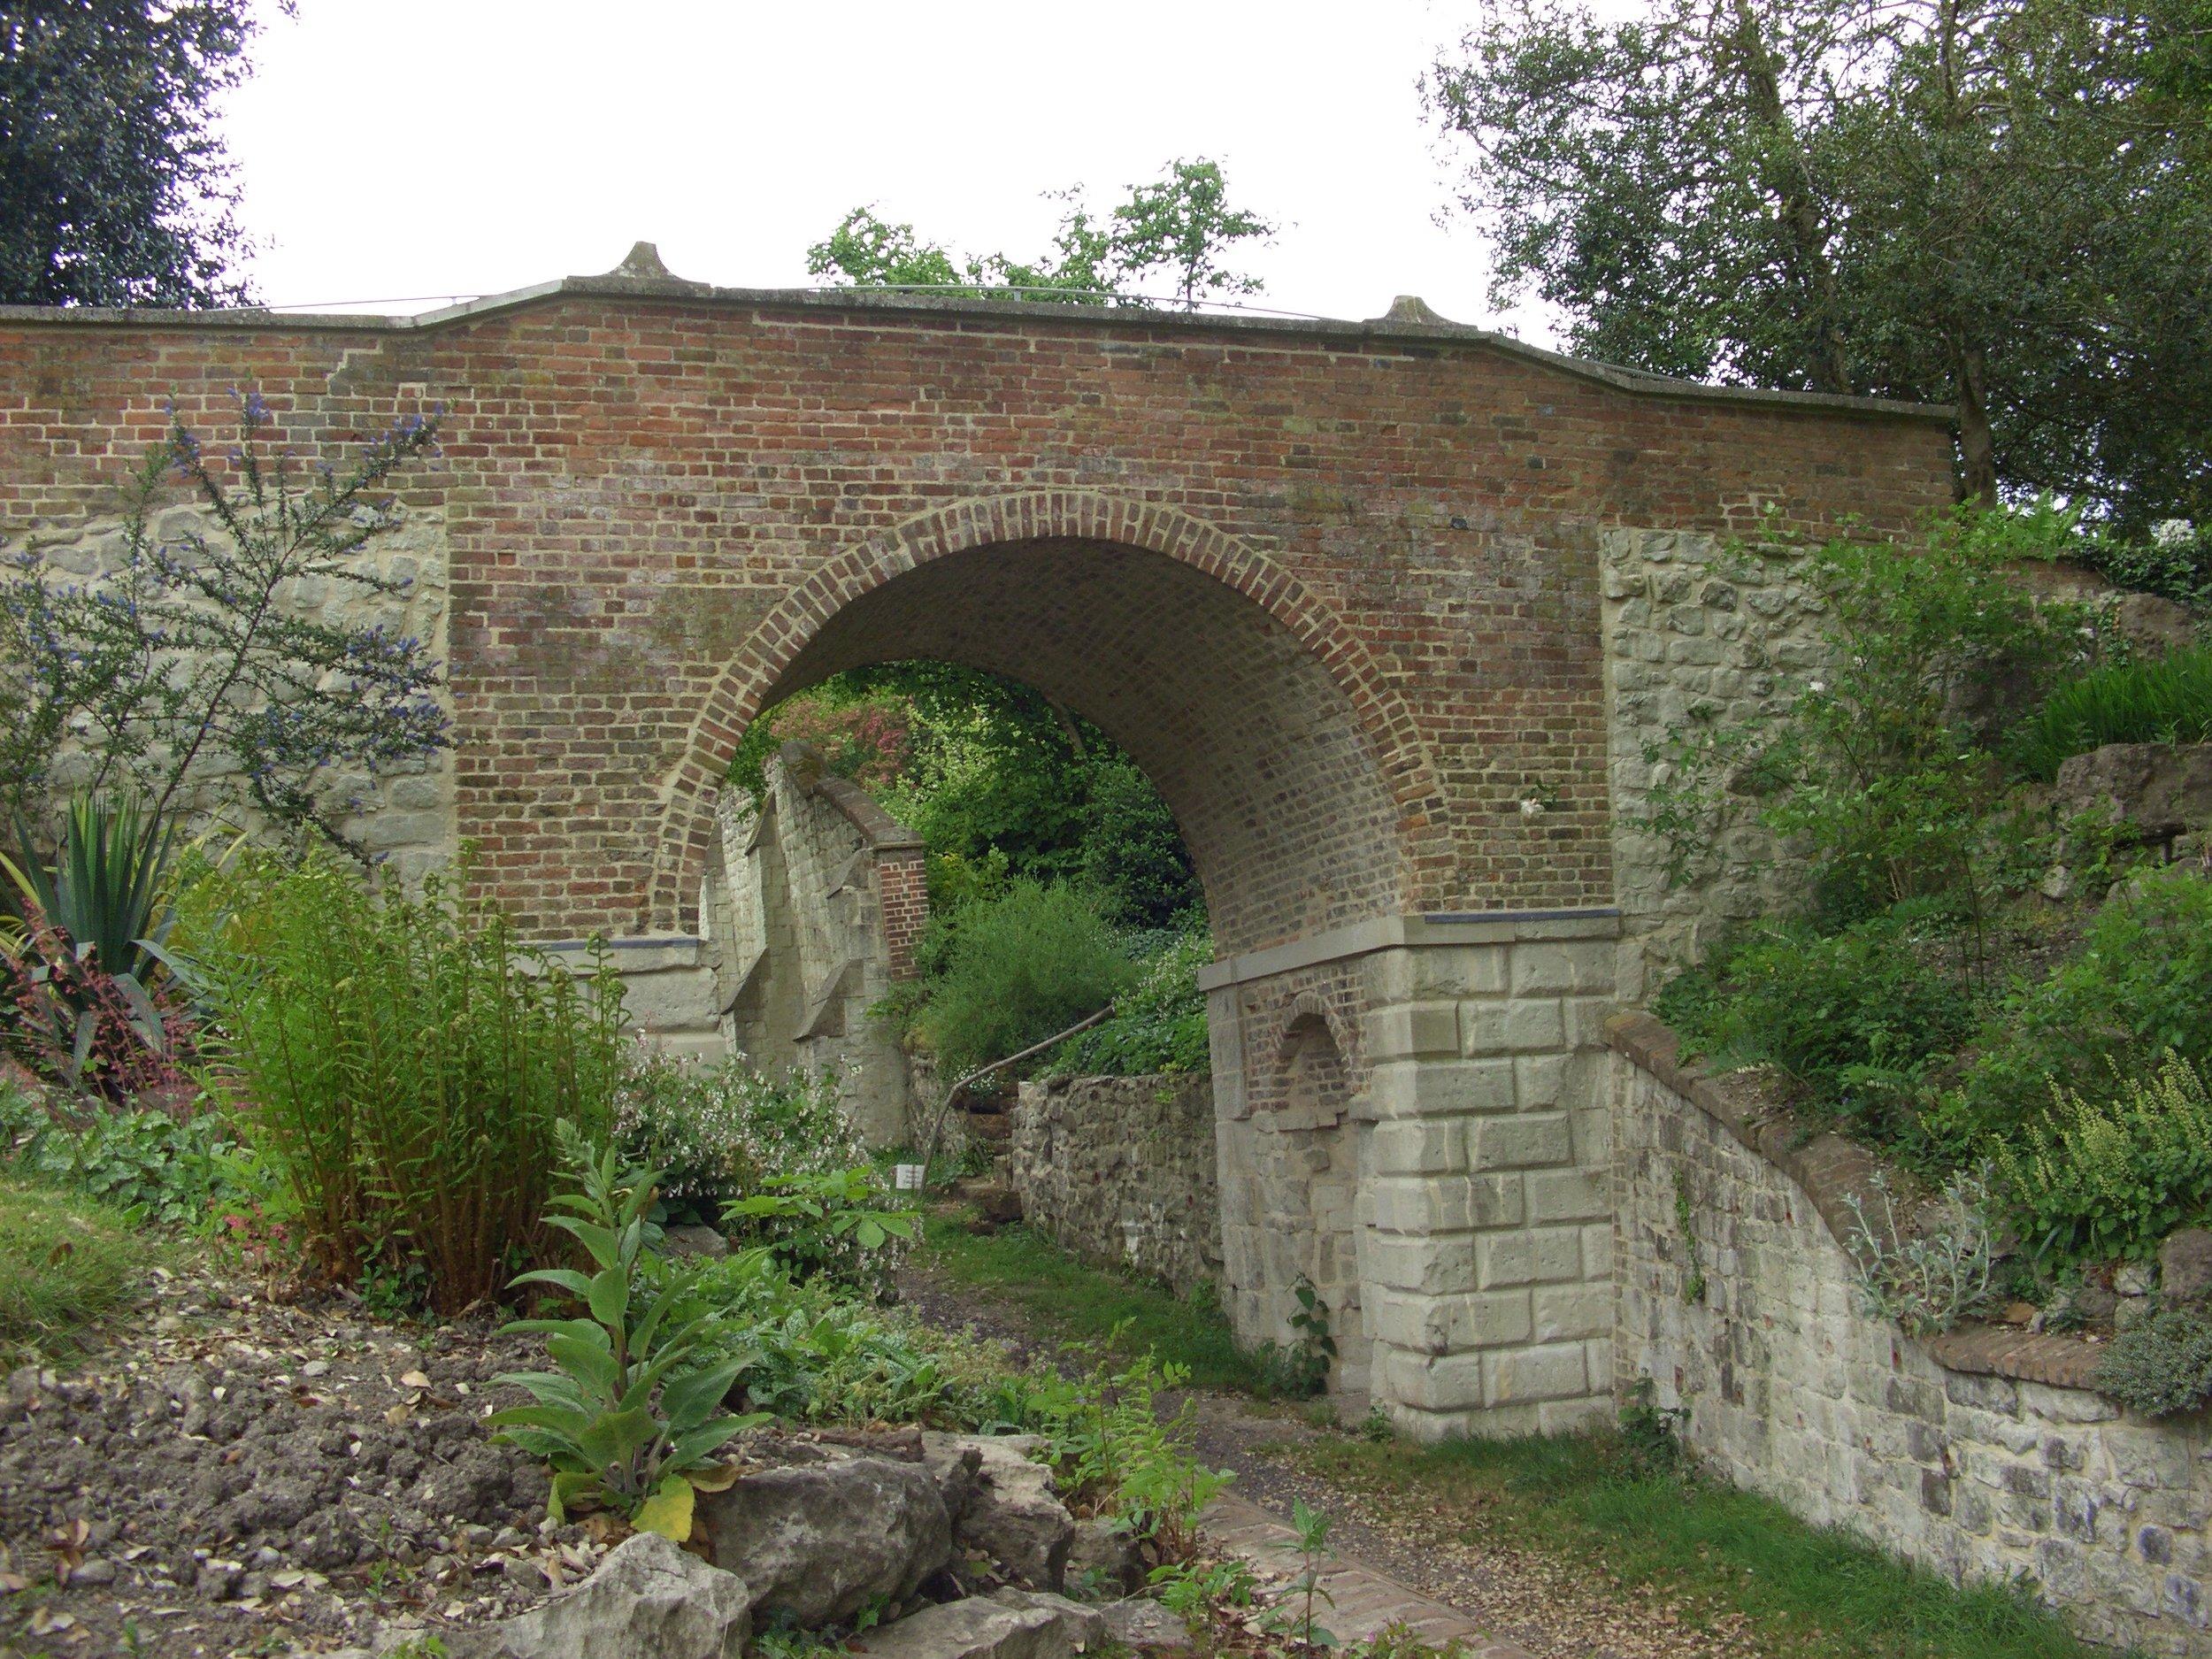 The dry arch bridge at Gatton Park in 2013